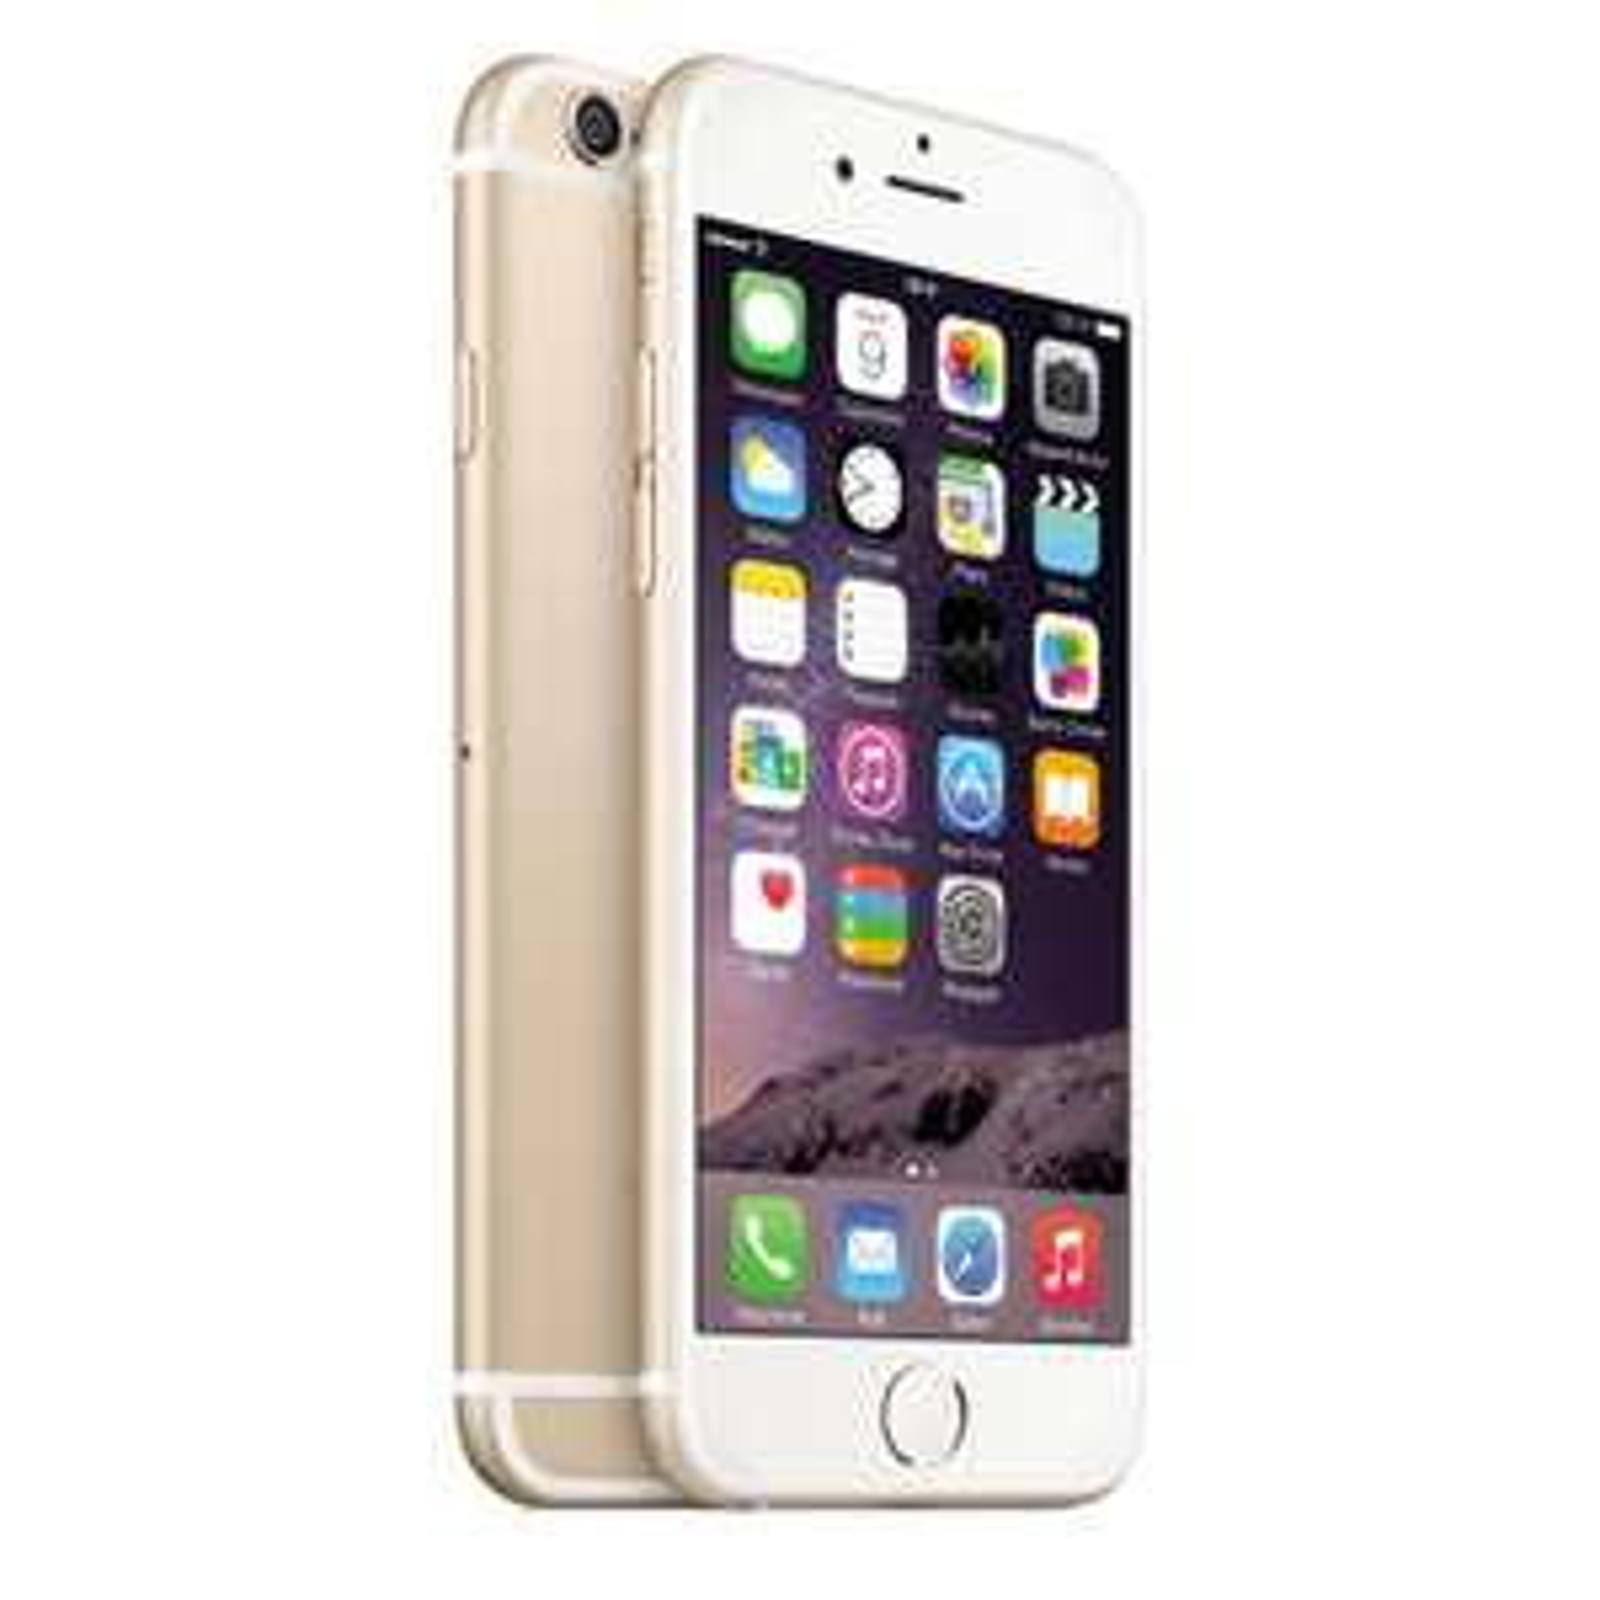 Smartphone iPhone 6 16 Go - Reconditionné (Garantie 6 mois)